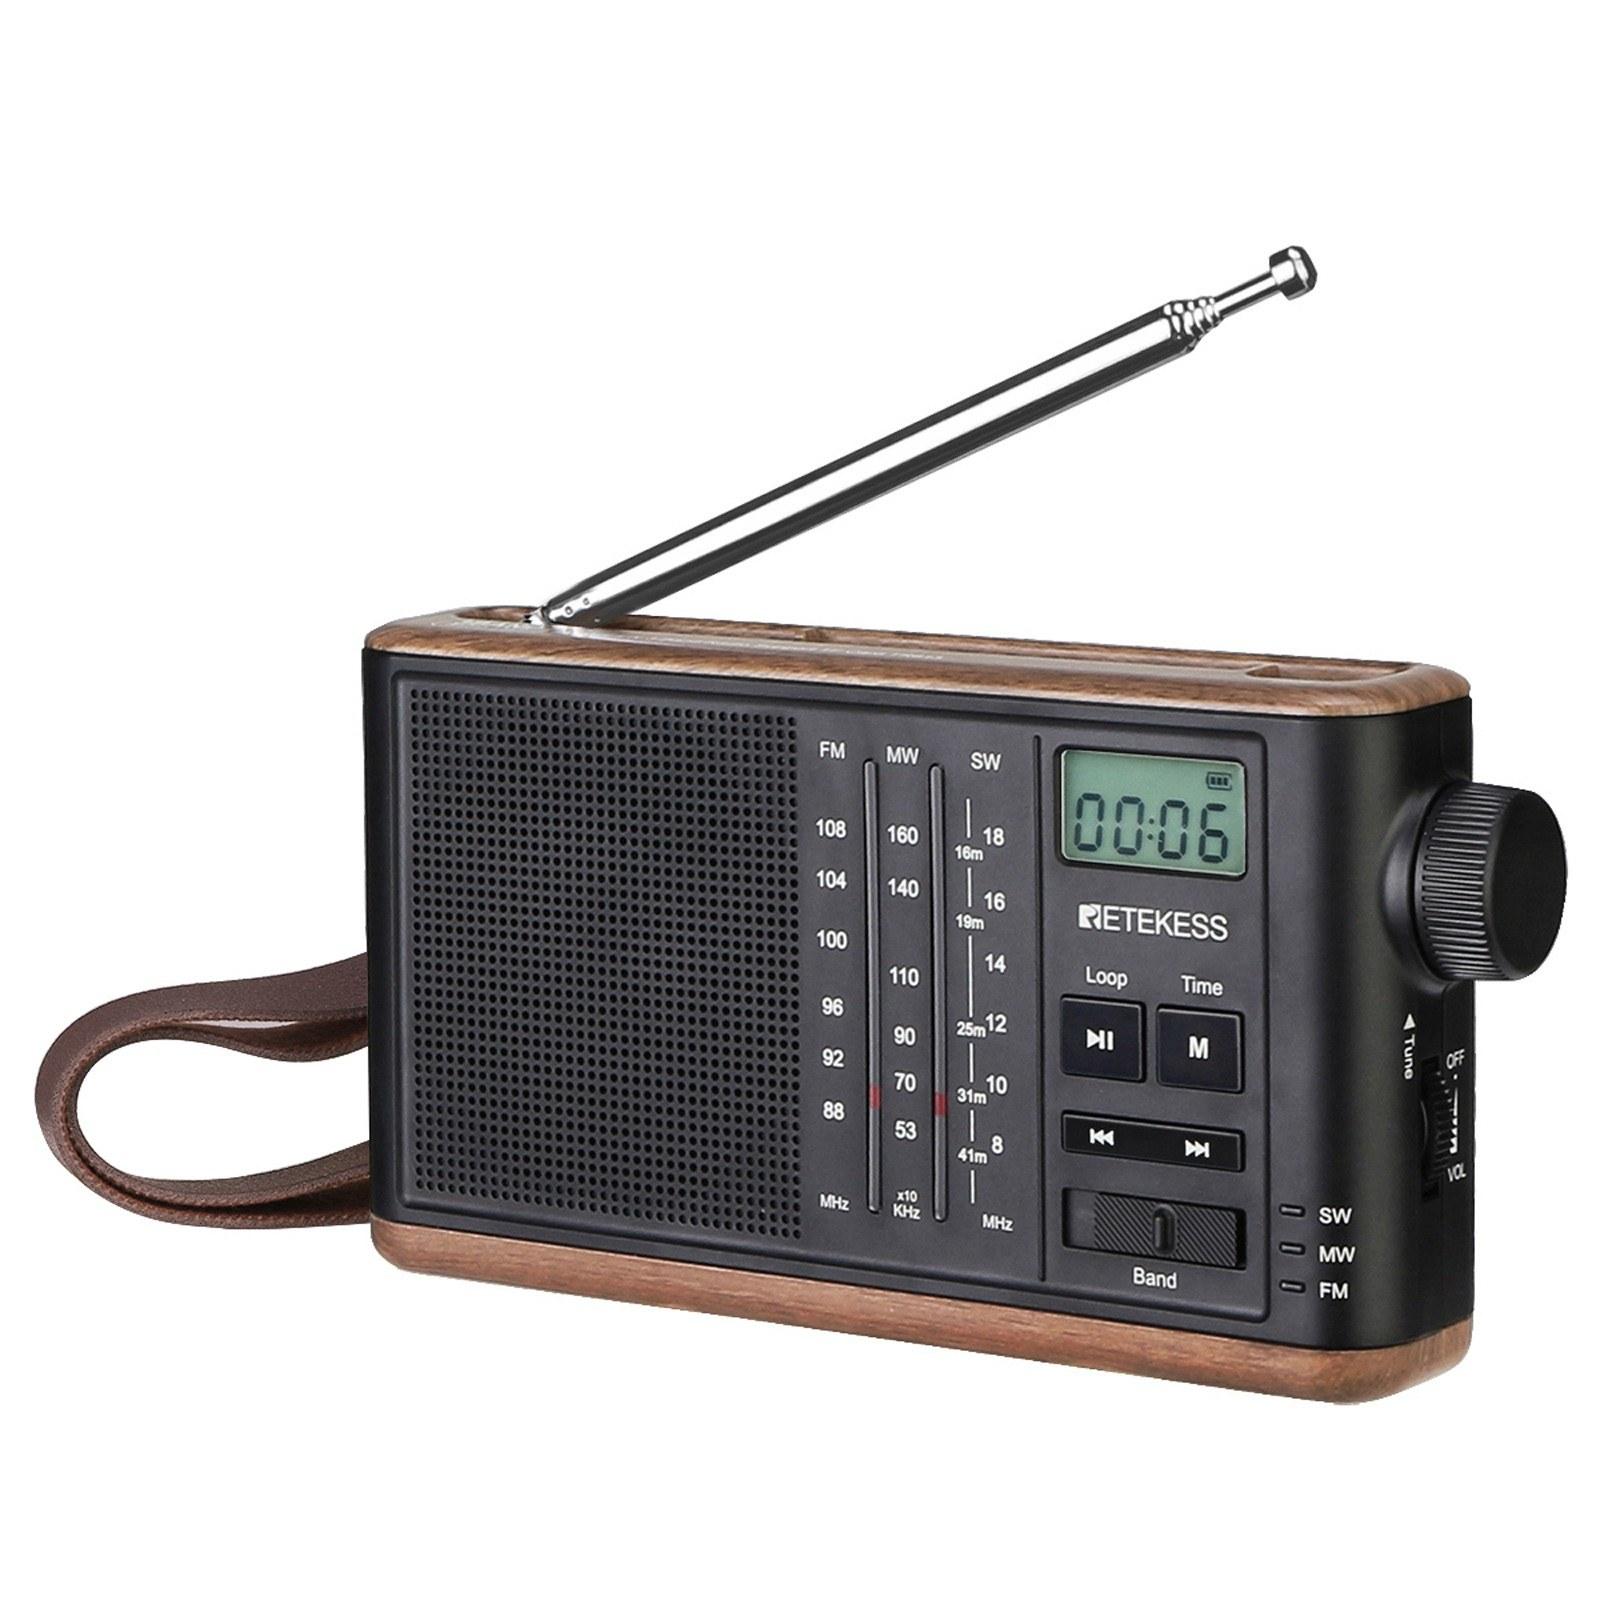 tomtop.com - 36% OFF Retekess TR613 FM/AM/SW Radio Multiband Radio Receiver, Limited Offers $33.99